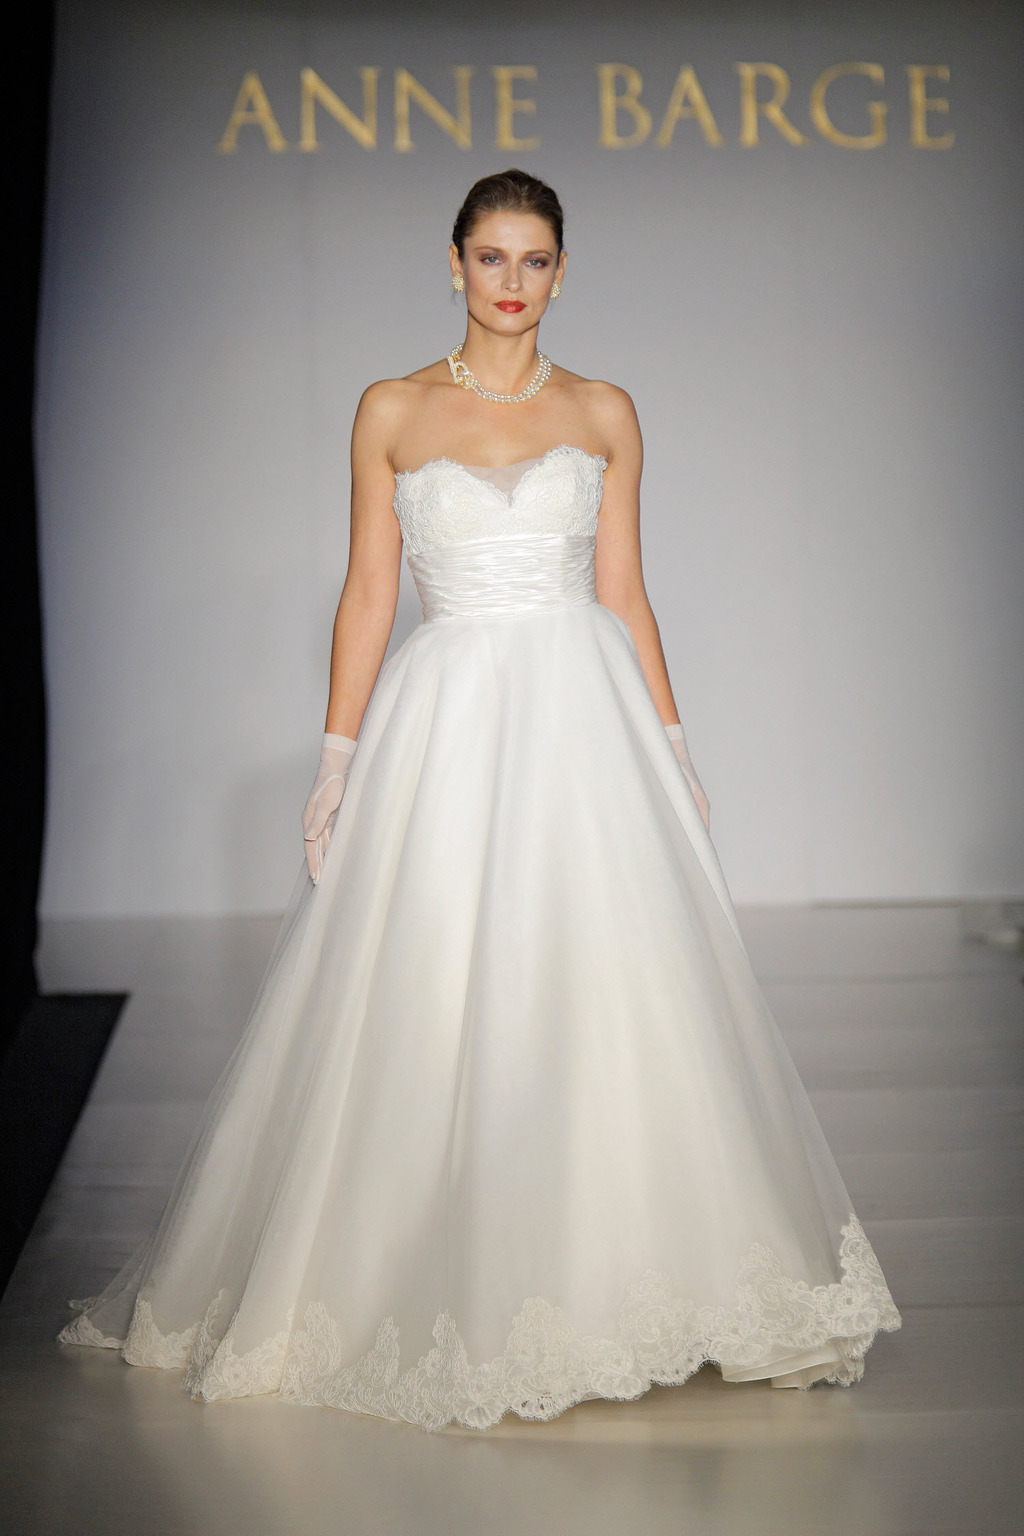 Fall-2011-wedding-dresses-anne-barge-grace-white-lace-bridal-gown-v-back-romantic-3.full